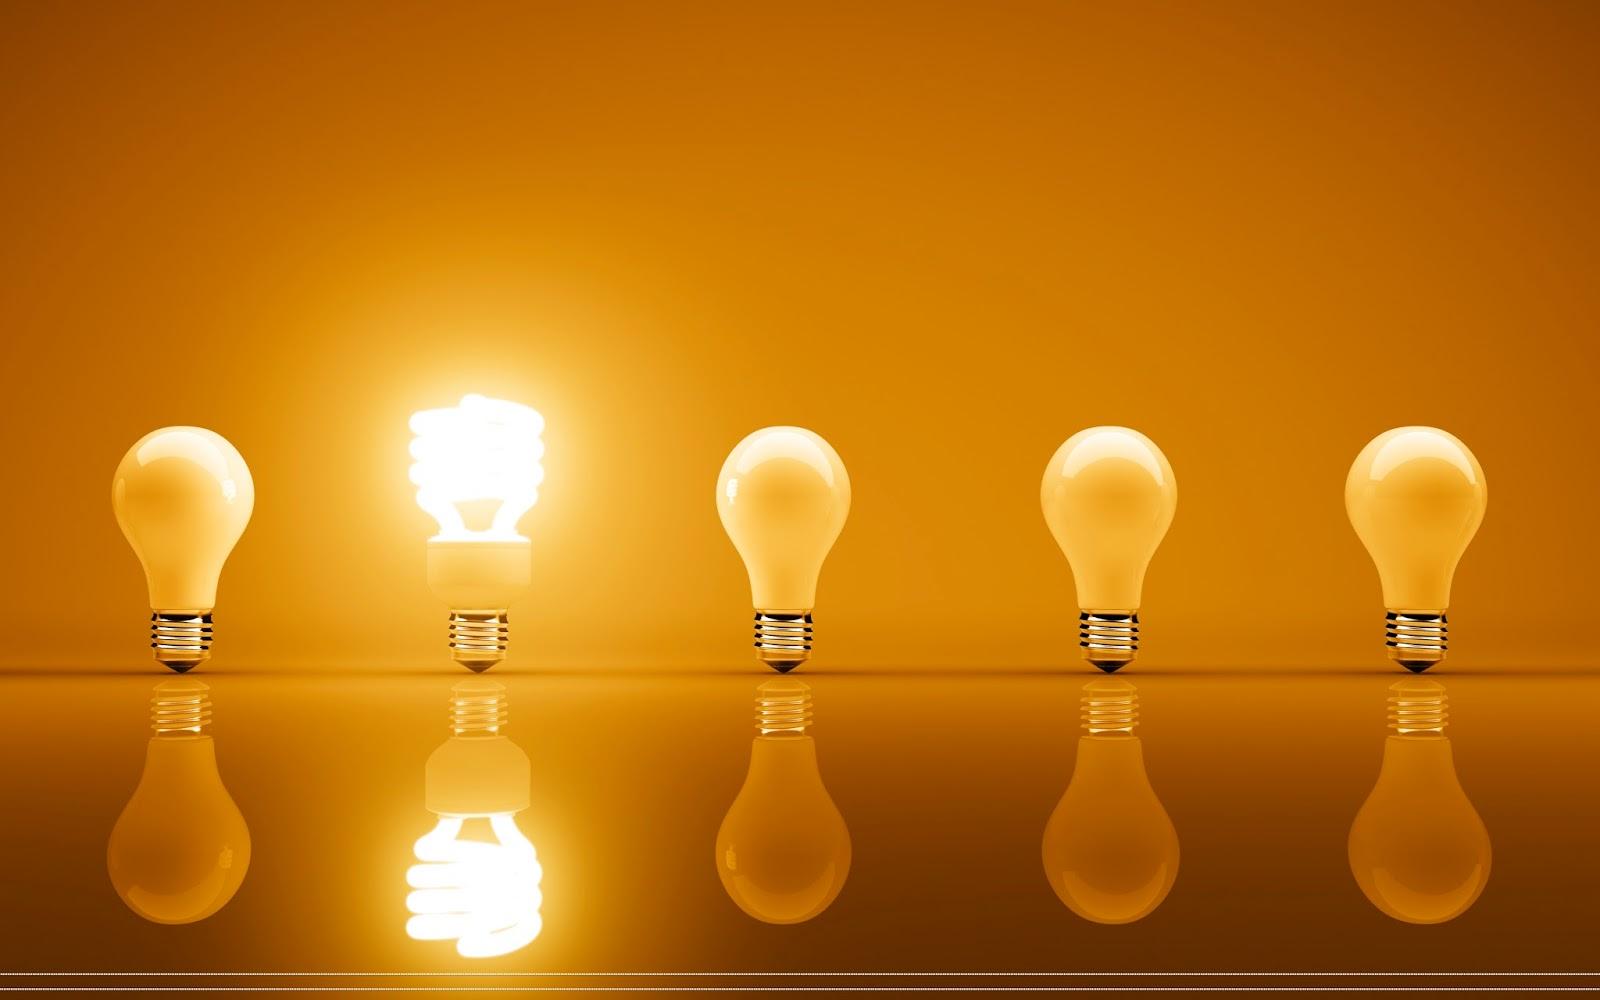 Mejor luz para estudiar led affordable iluminacin para estudiar with mejor luz para estudiar - Bombillas para estudiar ...